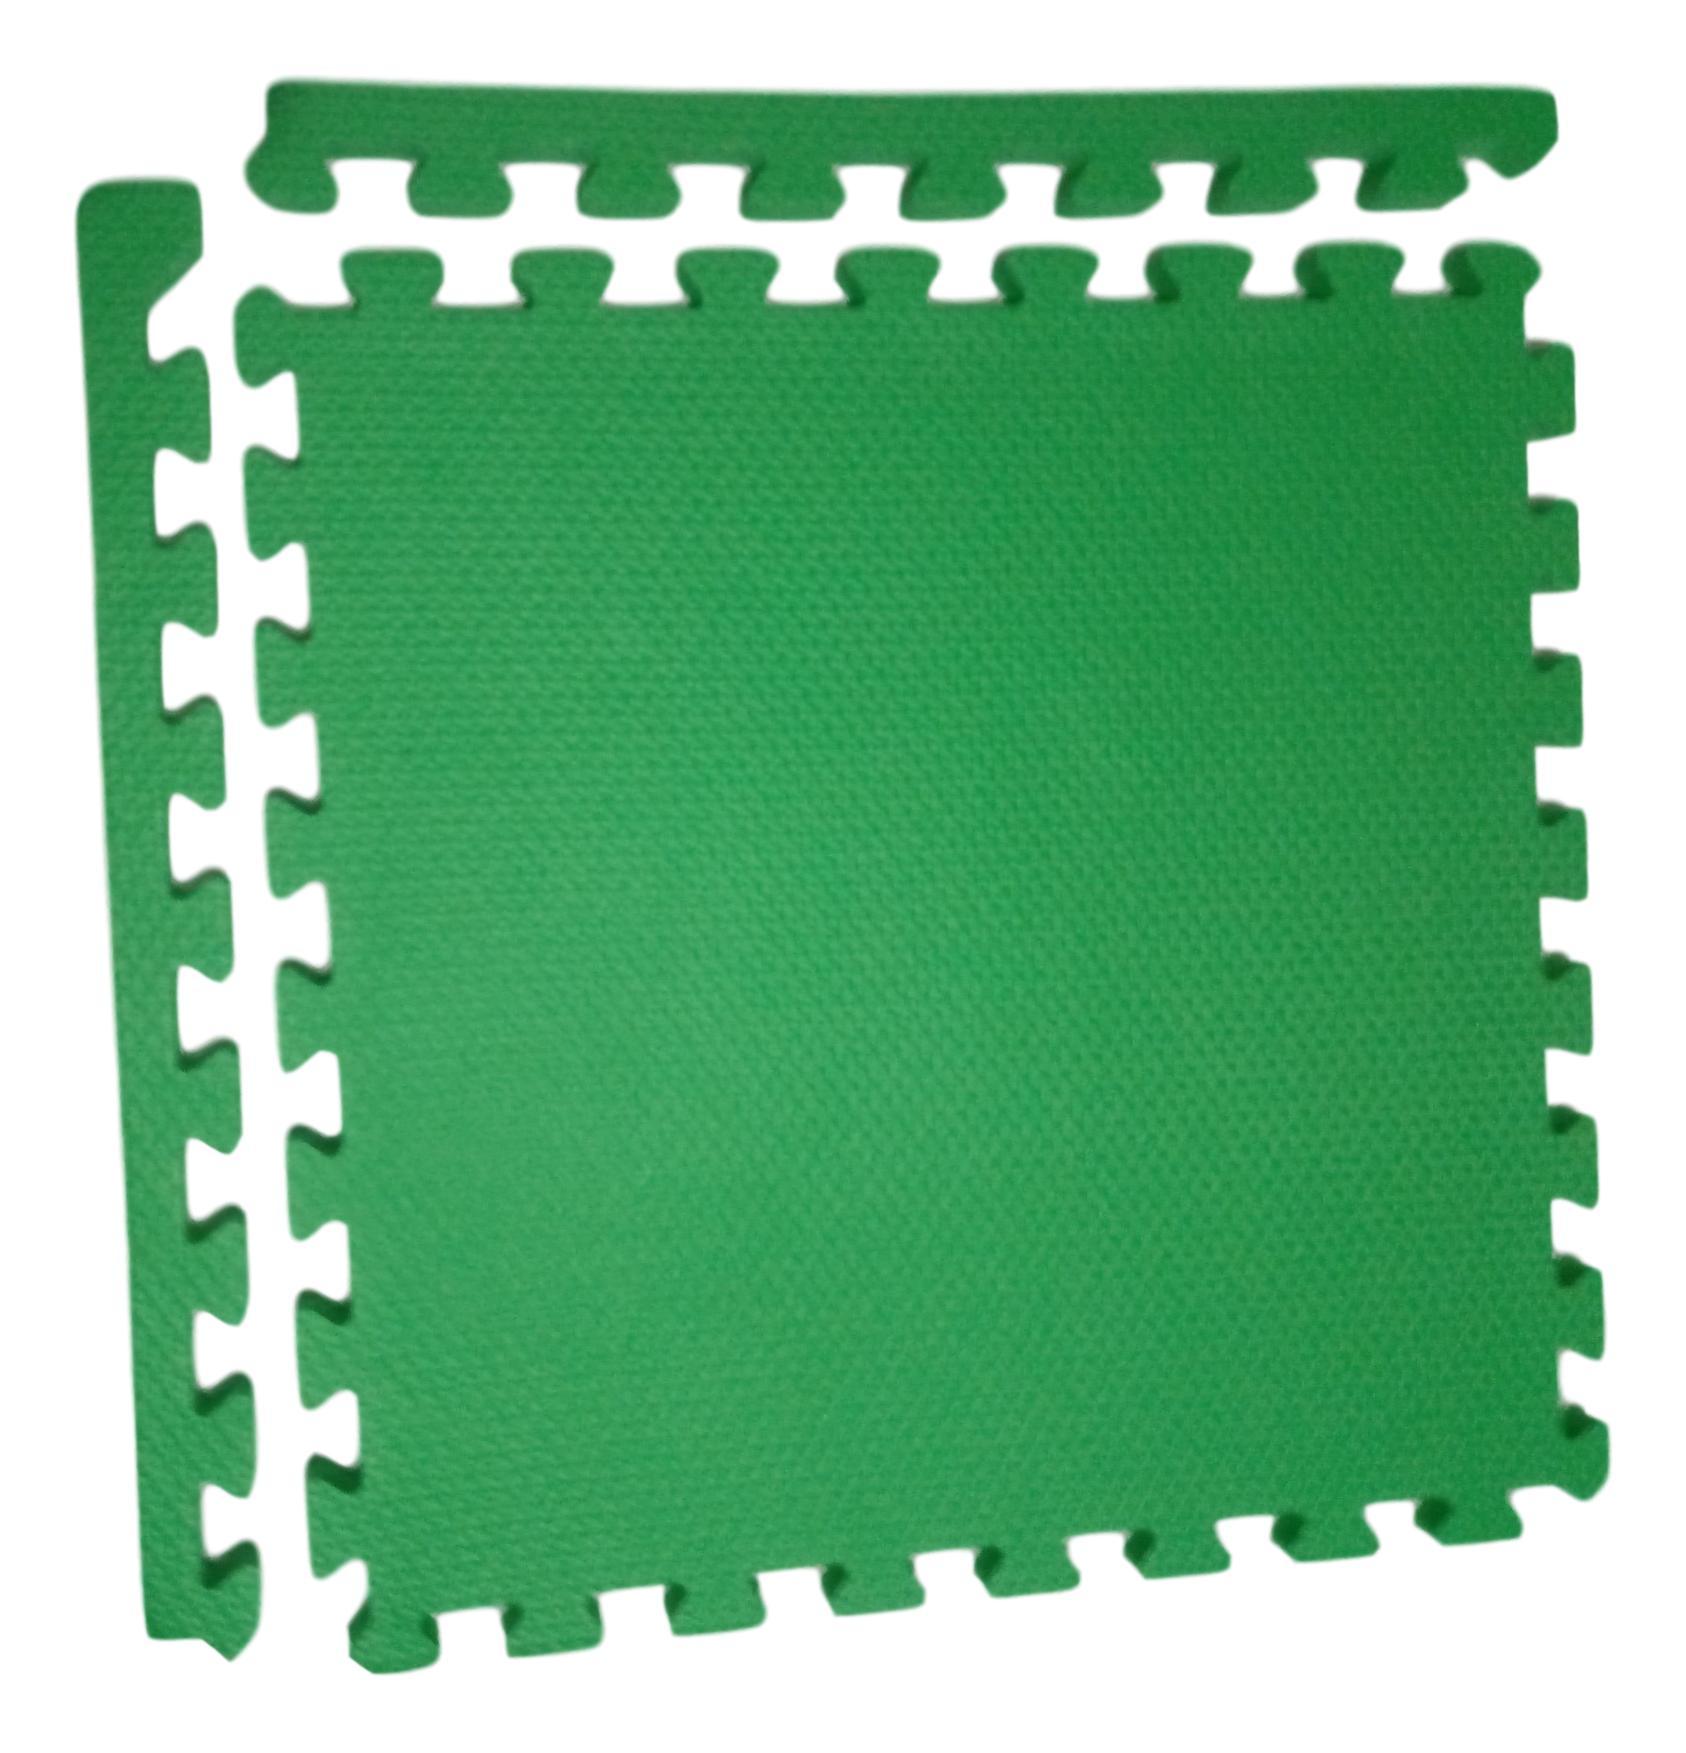 Kit 10 Tapetes Tatames Coloridos Eva 50cm X 50cm X 15mm C/ Borda